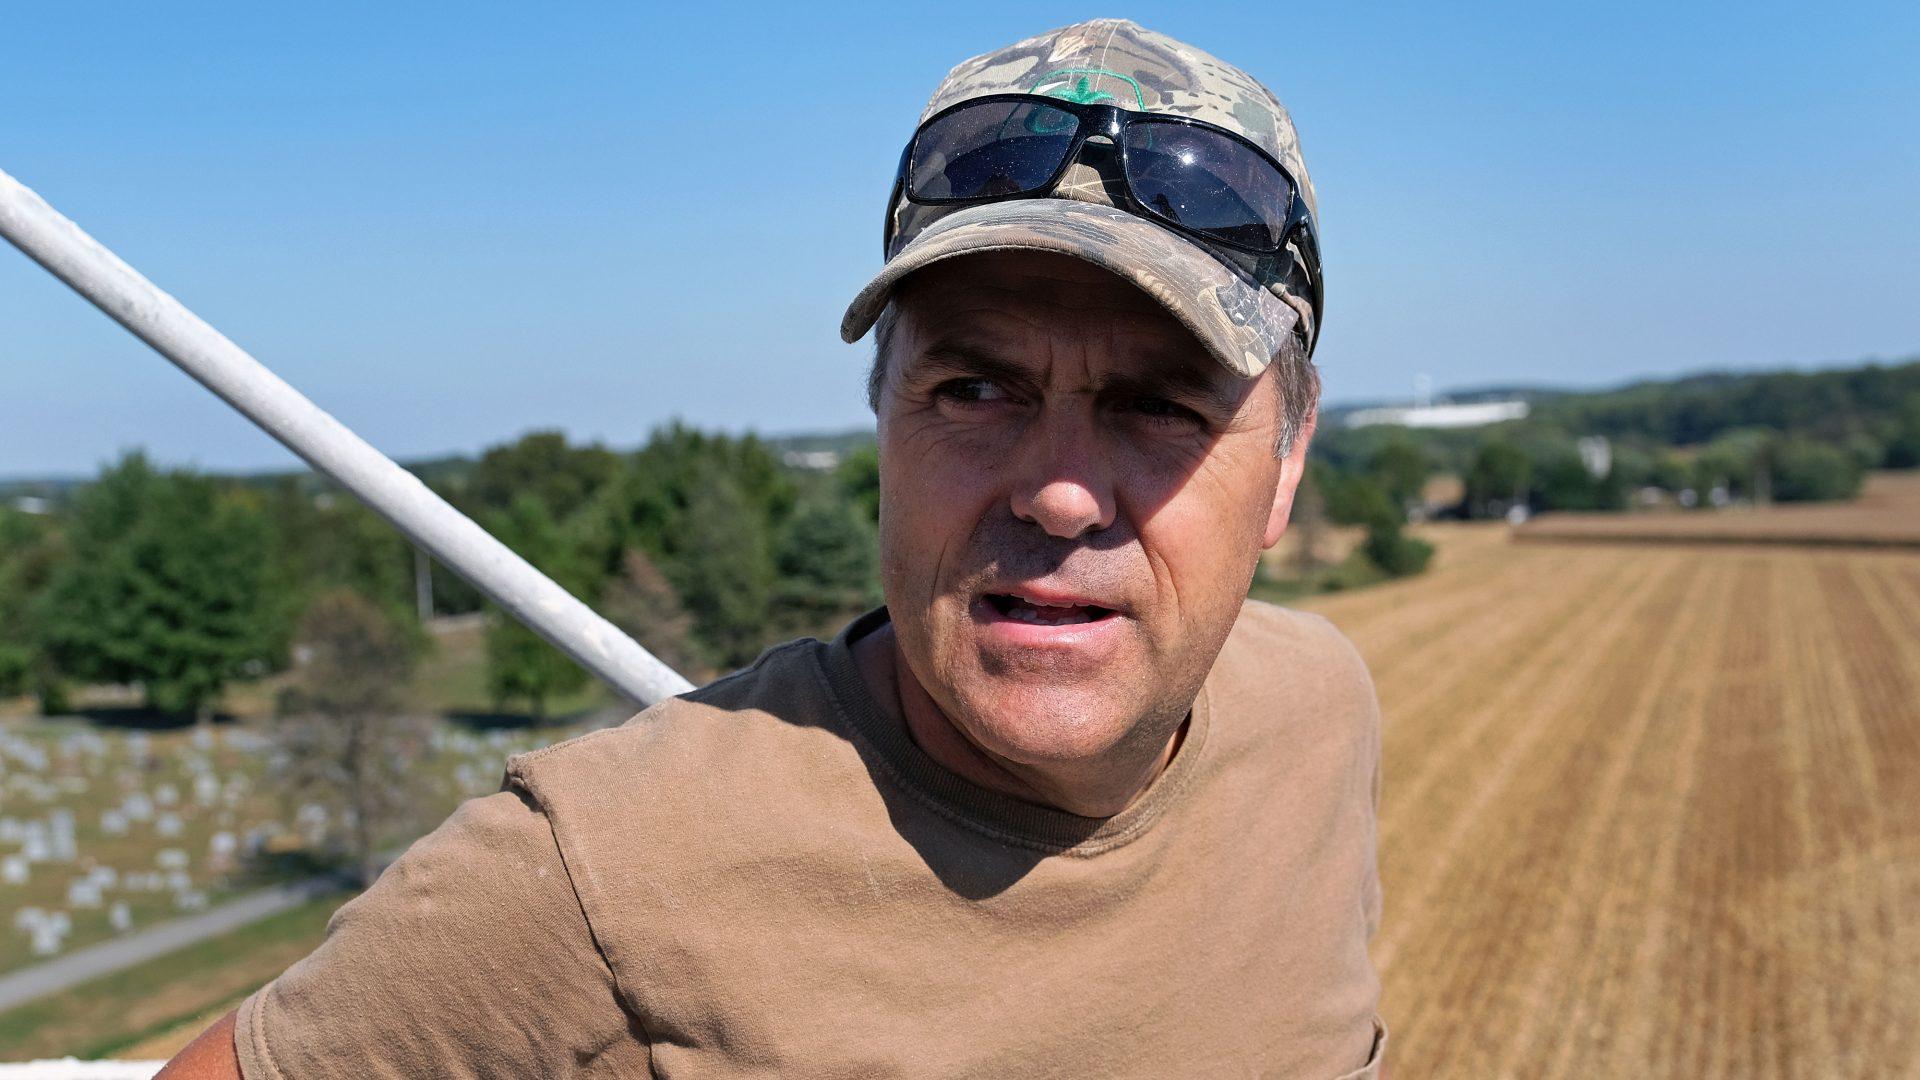 Grain farmer Don Cairns looks out over land he farms while atop a grain silo Sept. 25, 2019, at Cairns Family Farm in Sadsbury Township, Pennsylvania.